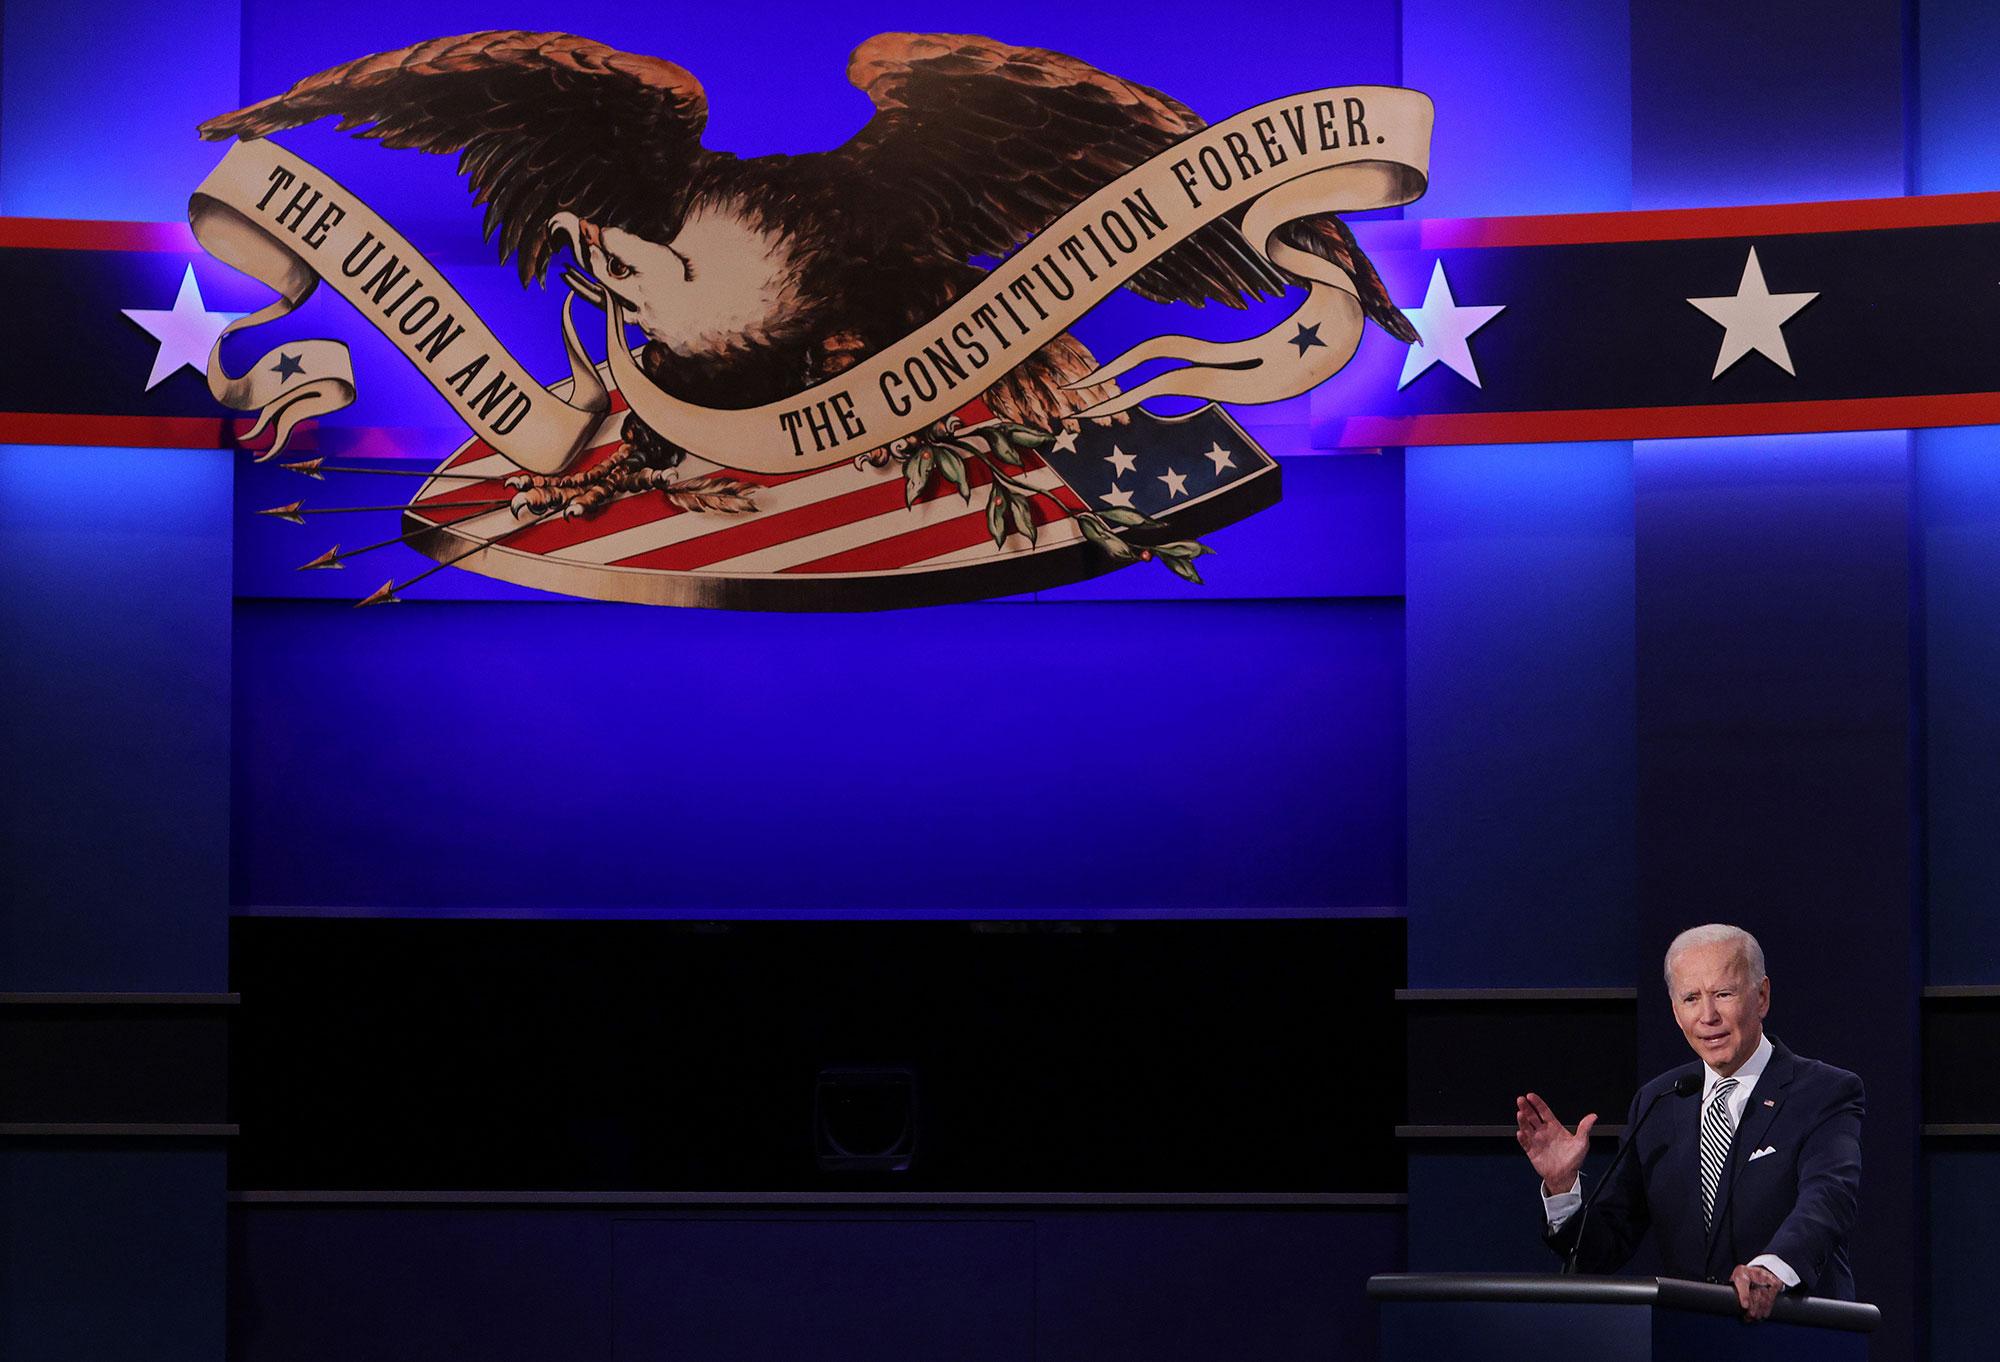 Democratic presidential nominee Joe Biden participates in the first presidential debate on September 29.